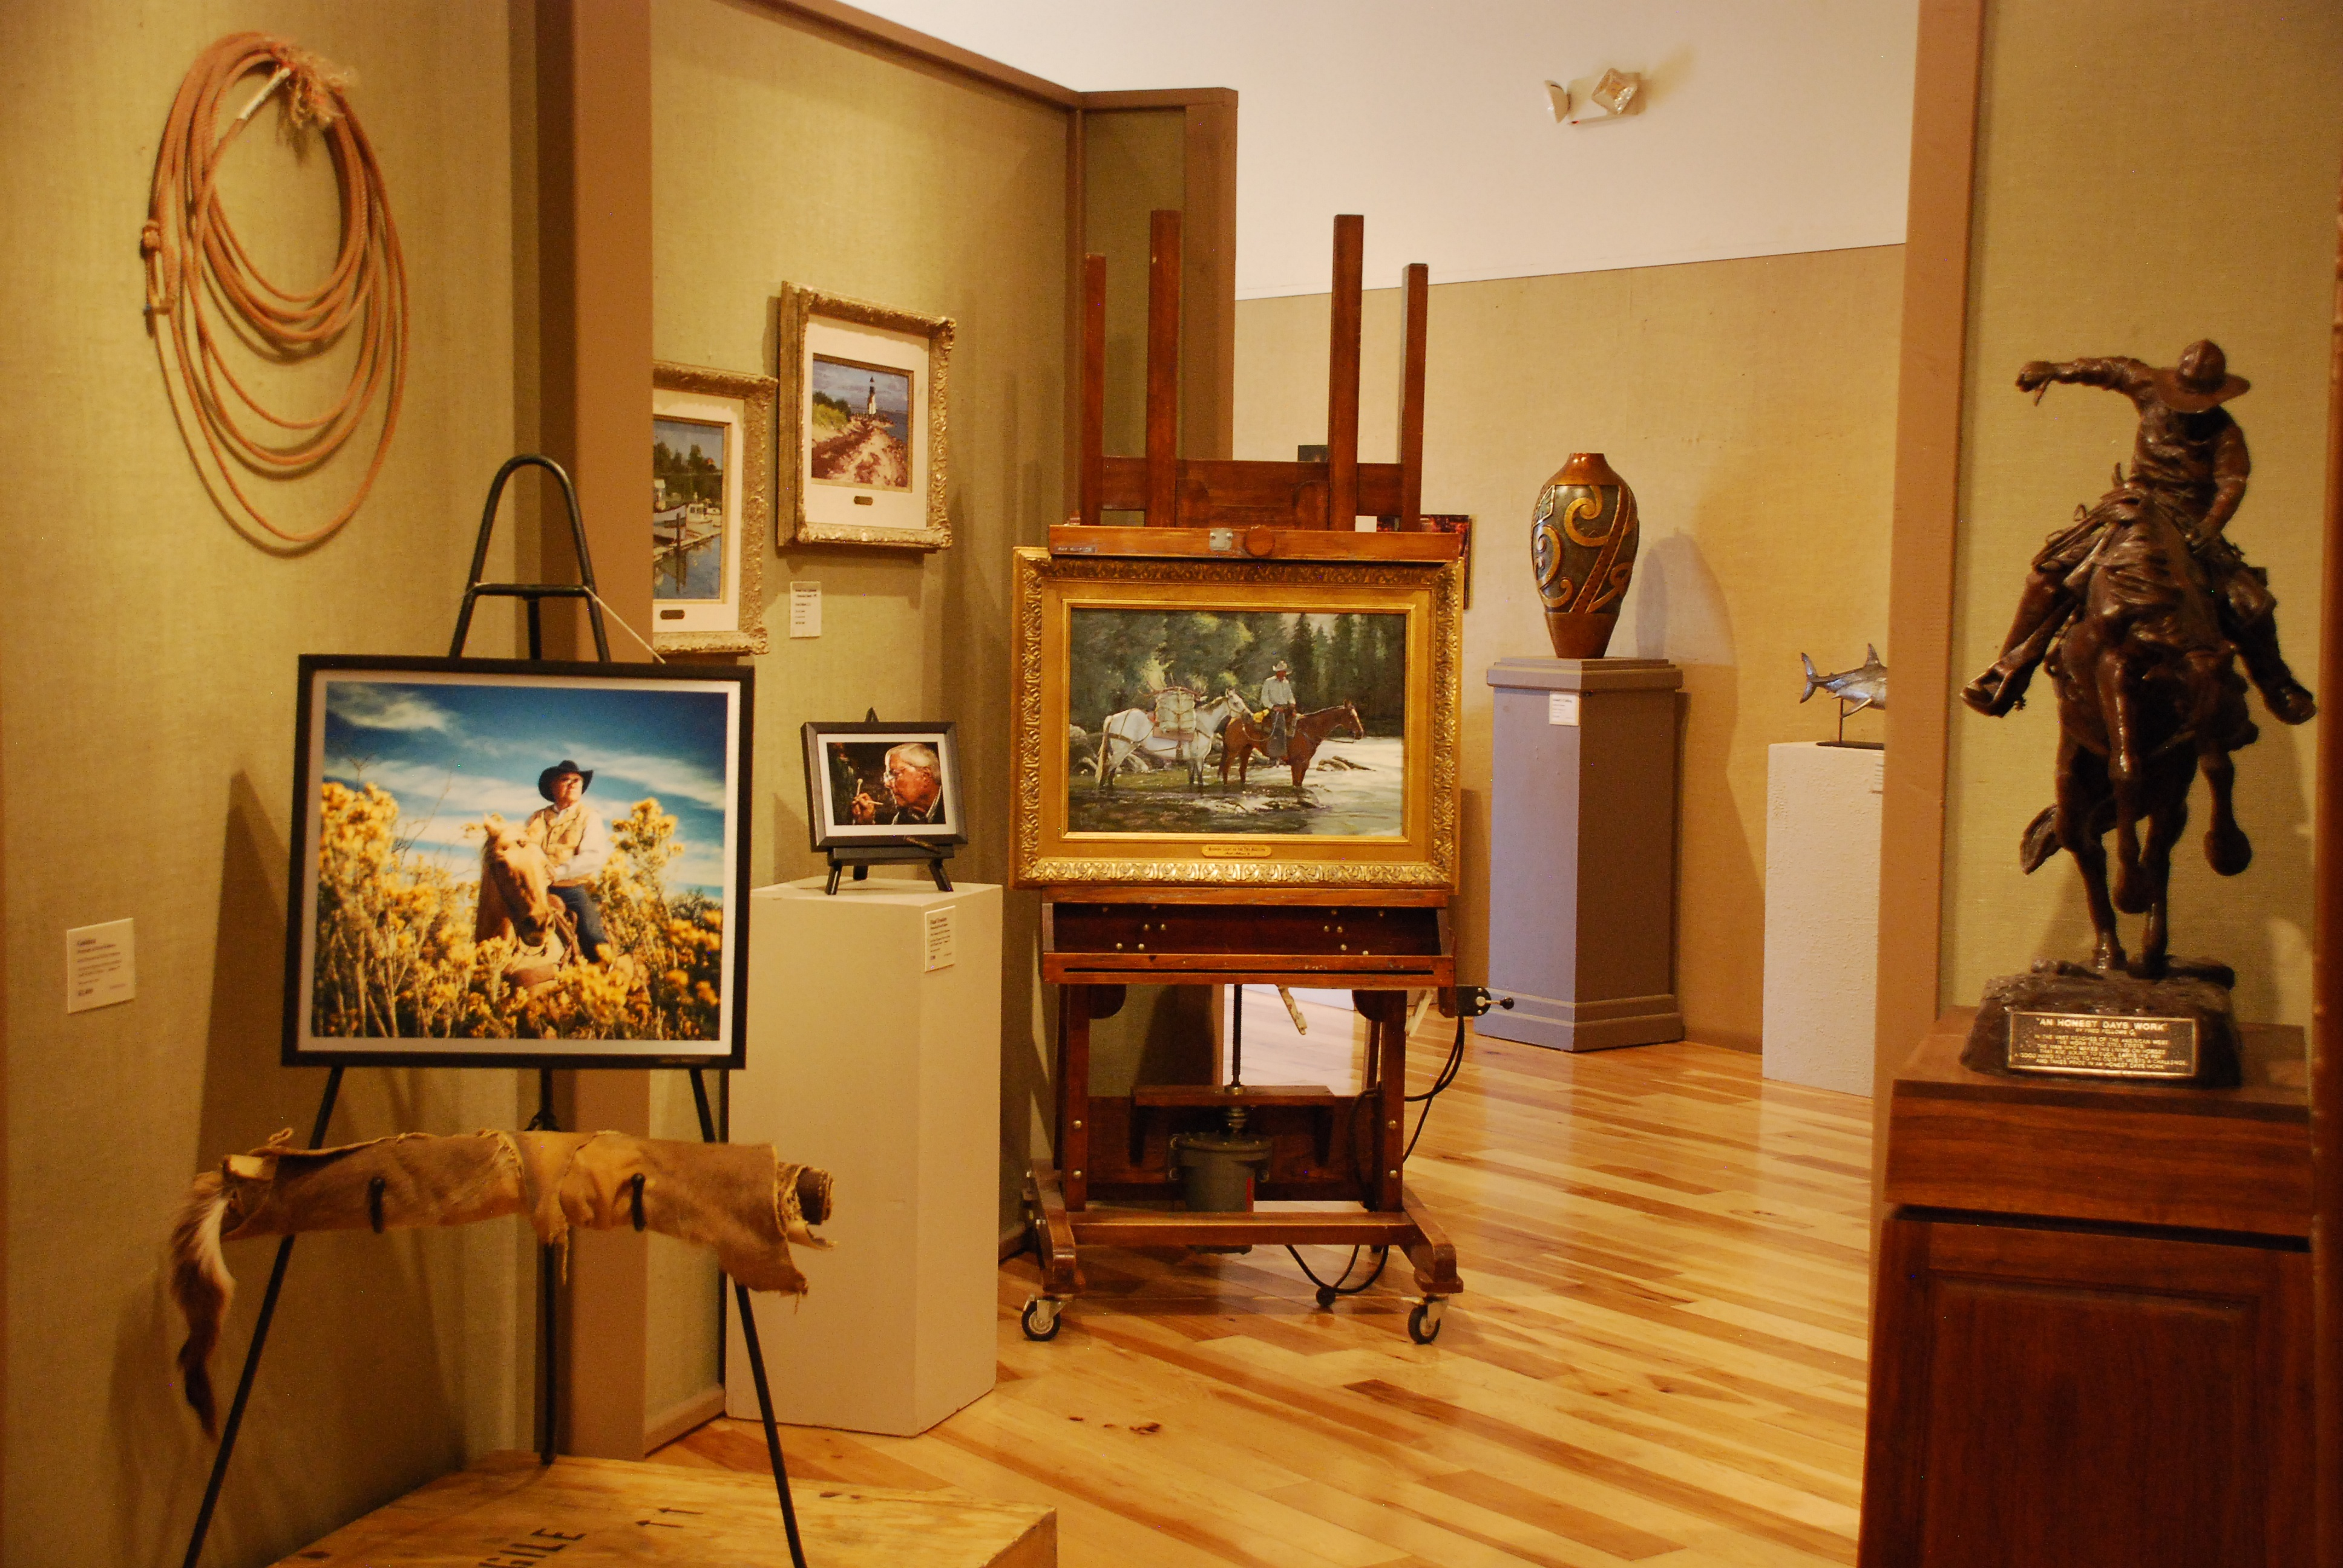 Exploring the Arts in Arizona's Mile-High City